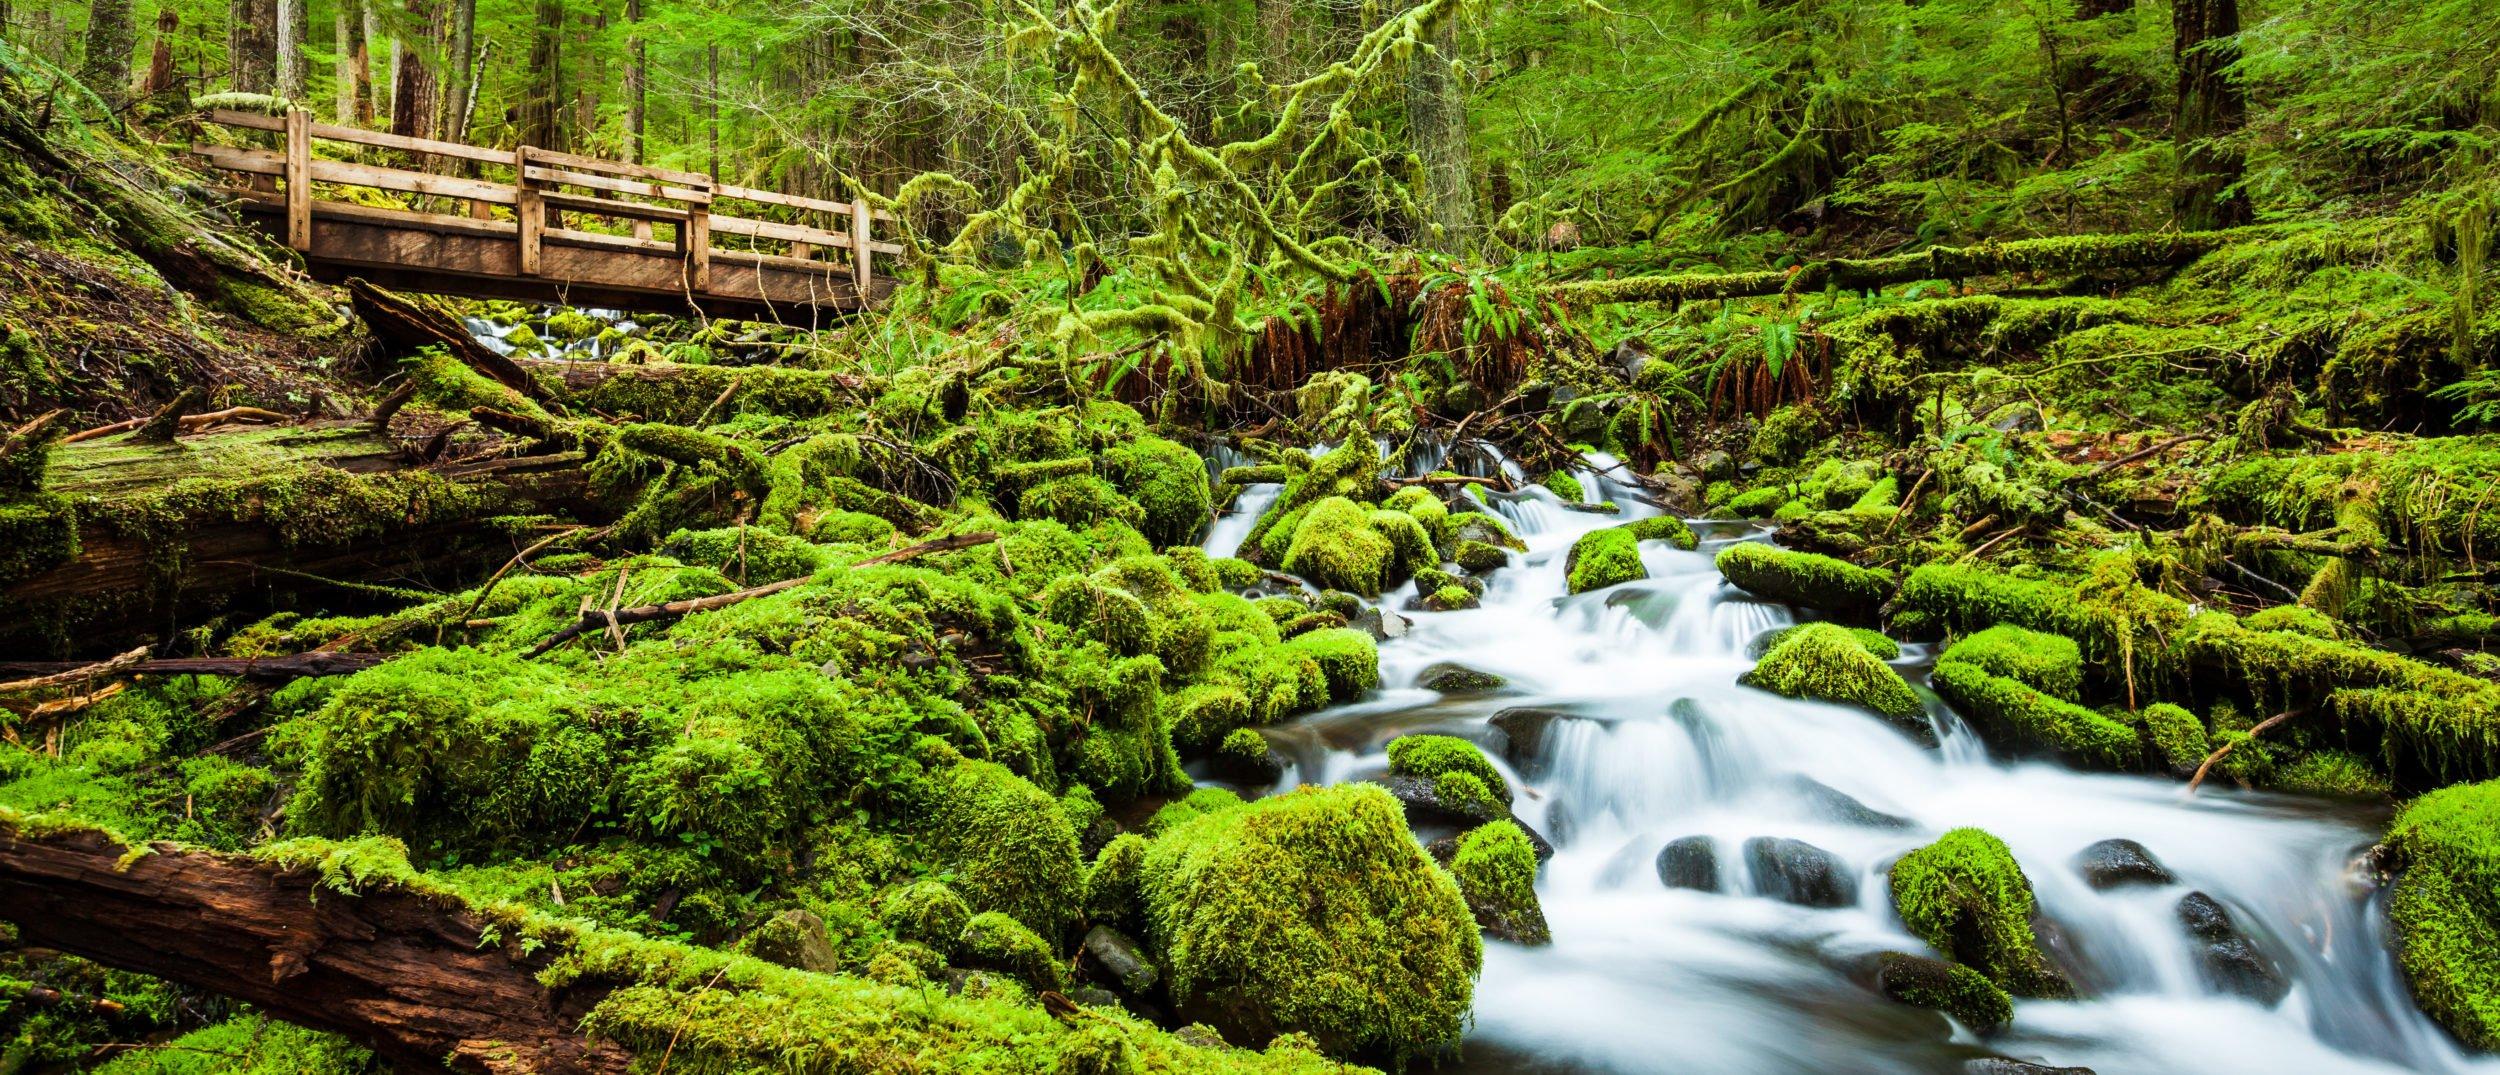 Beautiful cascade waterfall in Sol Duc falls trail, Olympic National Park, Washington. (Photo: Shutterstock)